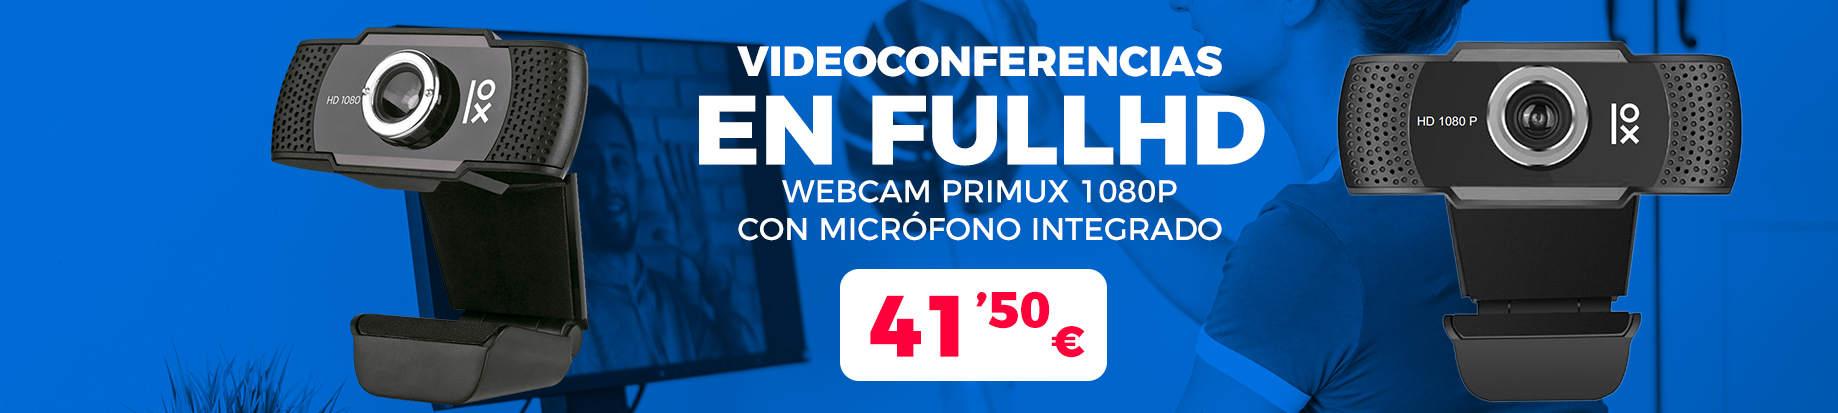 webcam-fullhd-microfono-derecha